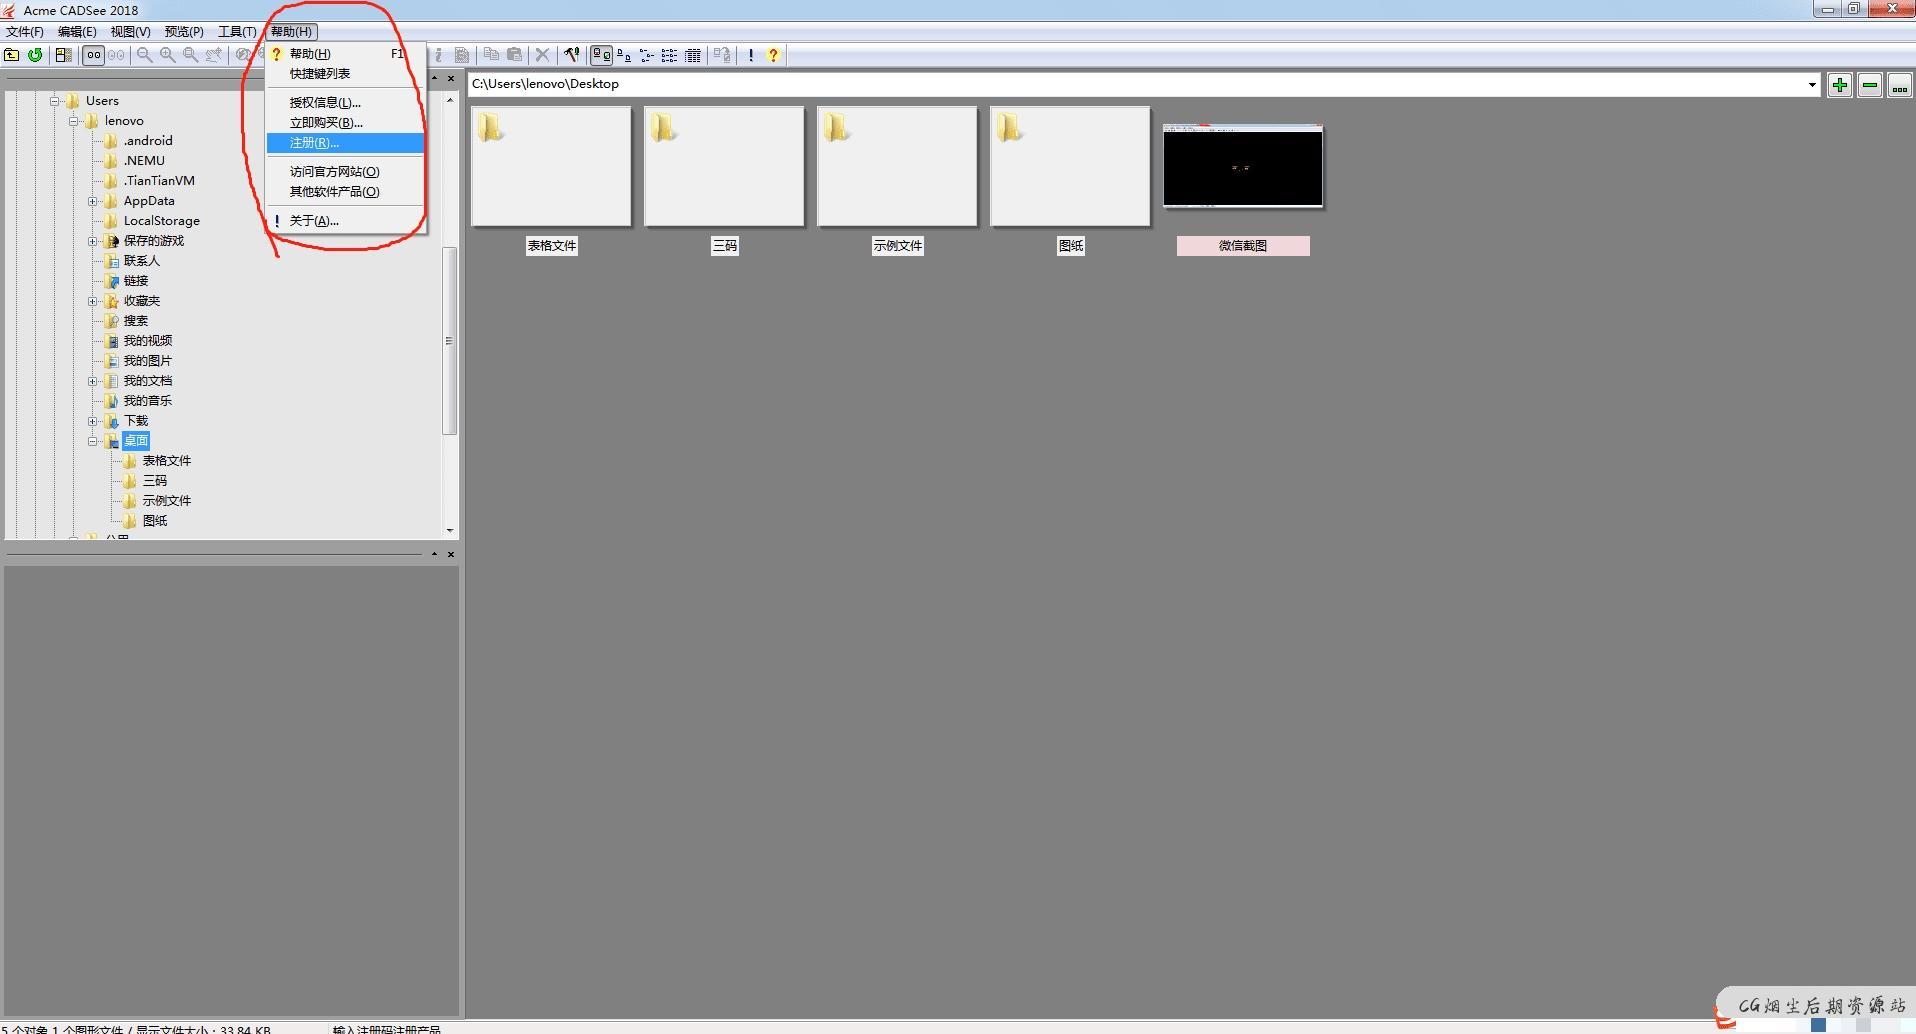 [Windows] Acme CAD See2018看图工具-附注册码-CG烟尘后期资源站